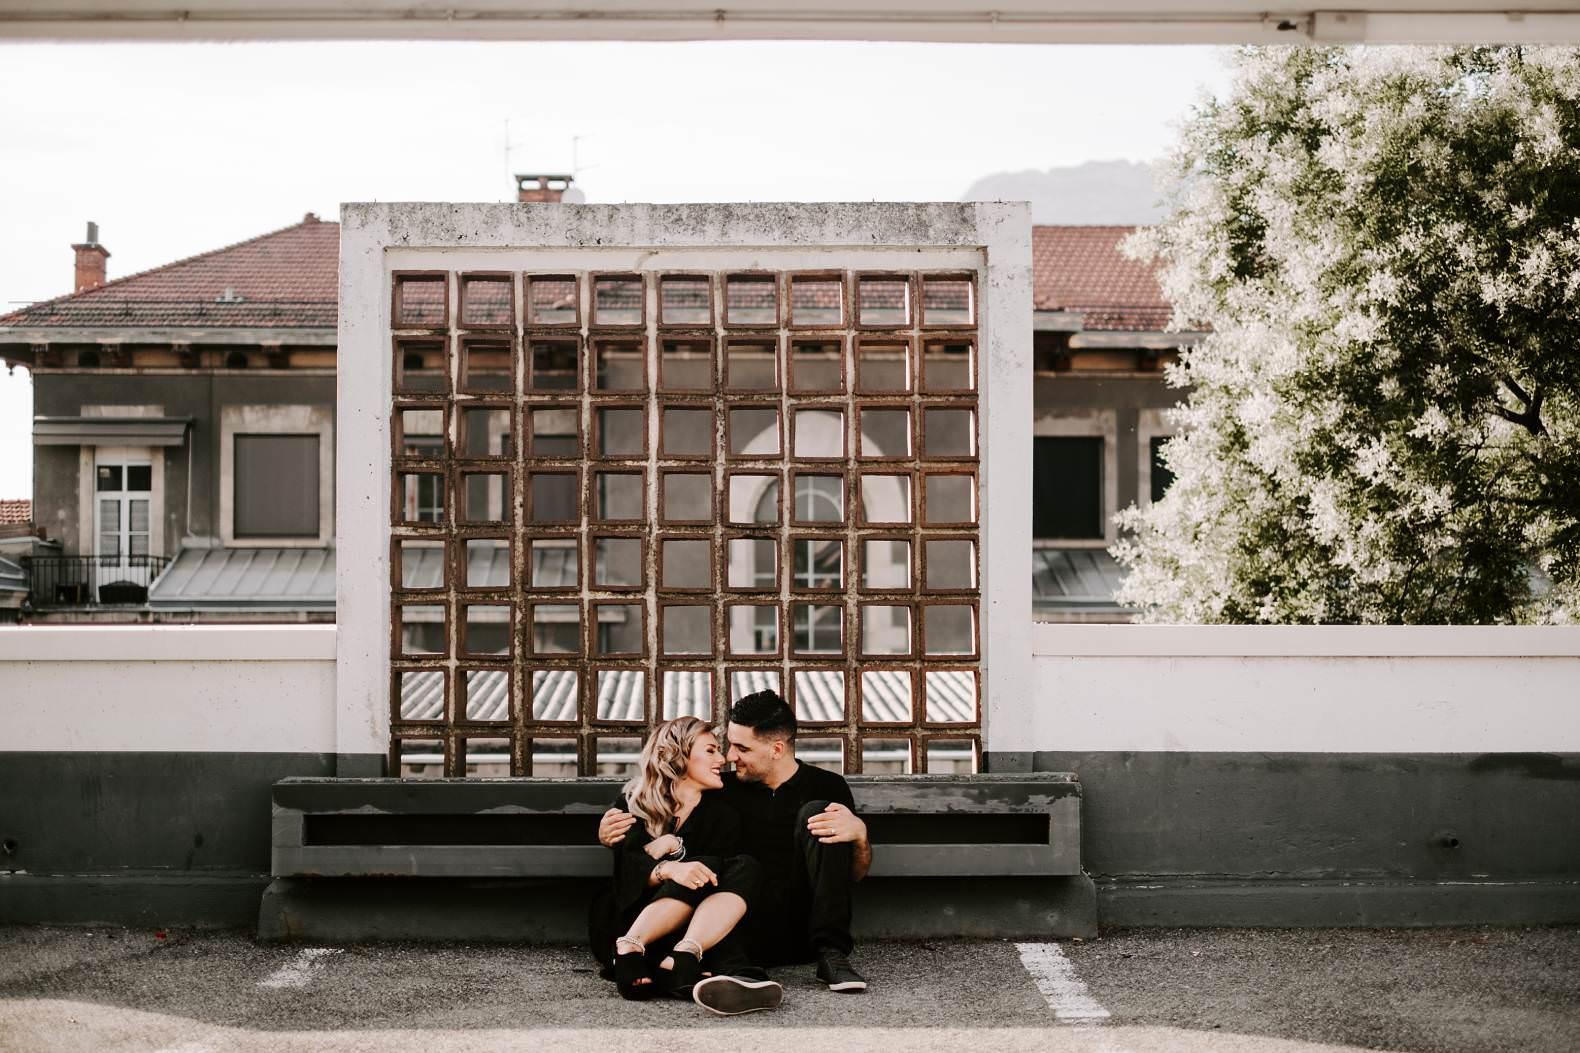 seance couple urbain grenoble chartreuse photographe bel esprit 0008